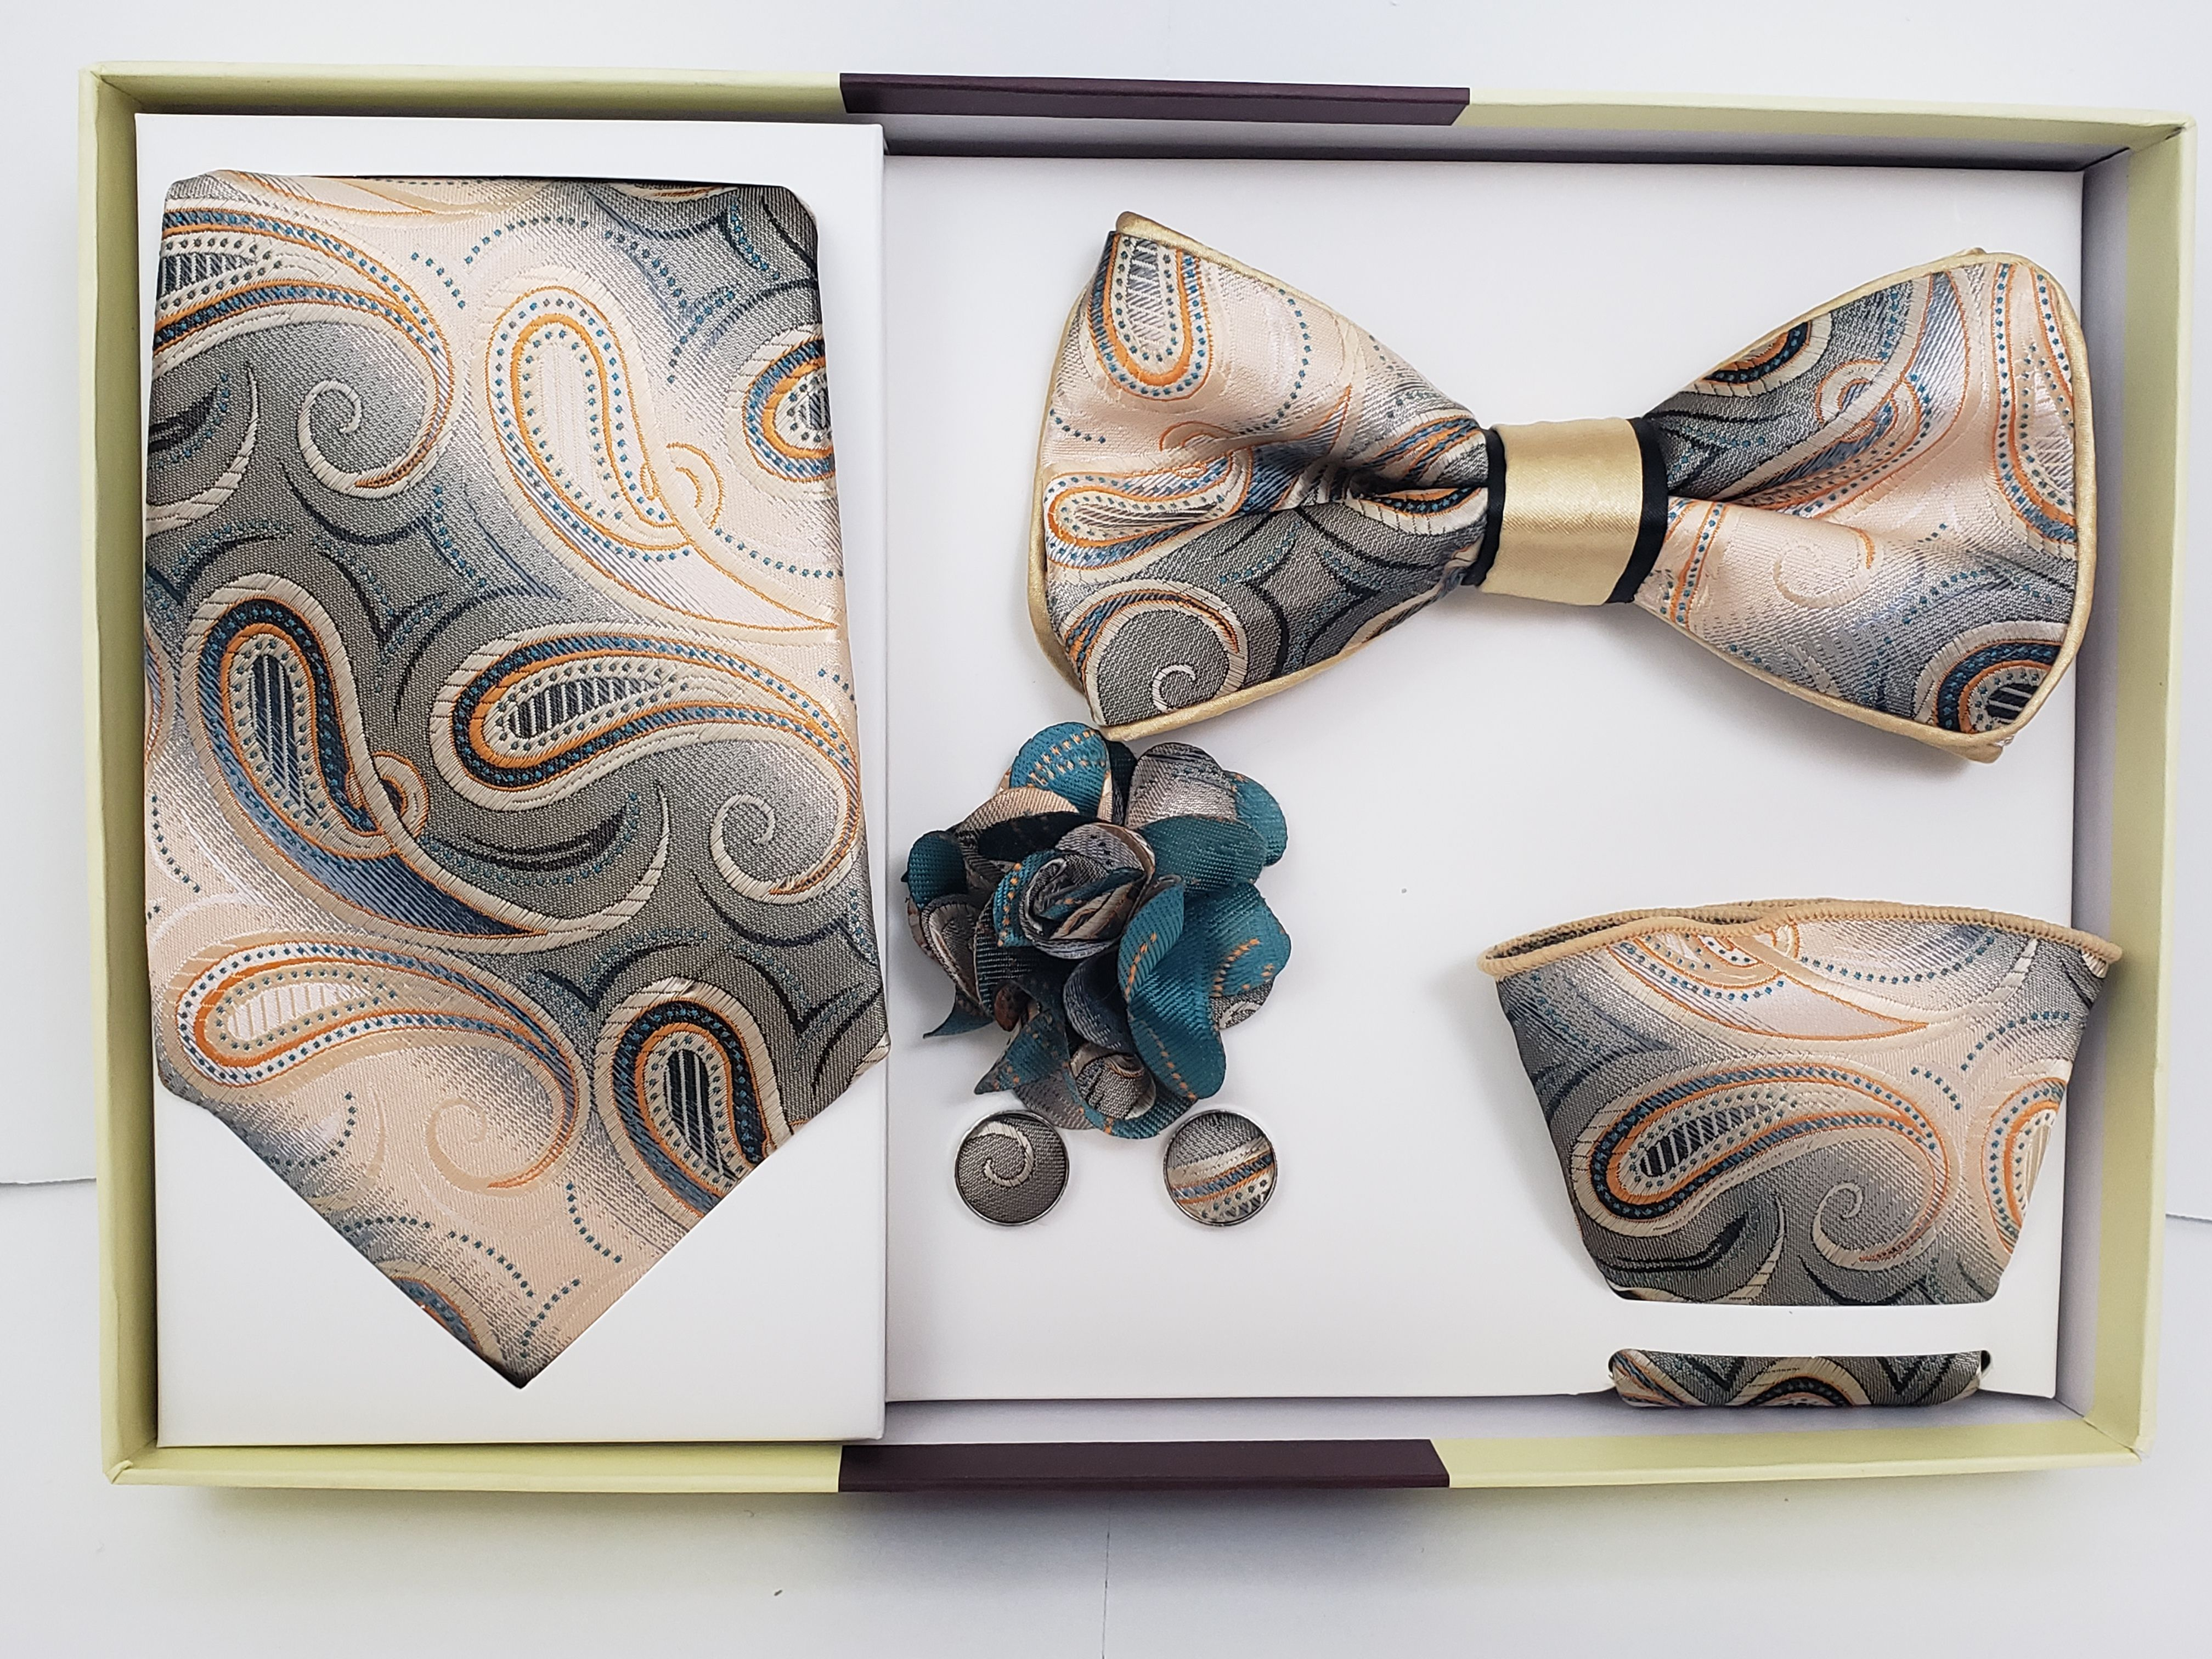 b04a23efabc5 Check this out from MashasCorner.com 5 Piece Matching Necktie & Bow Tie Box  Set Paisley Blue Gold Orange on Black - Handkerchief Round, ...